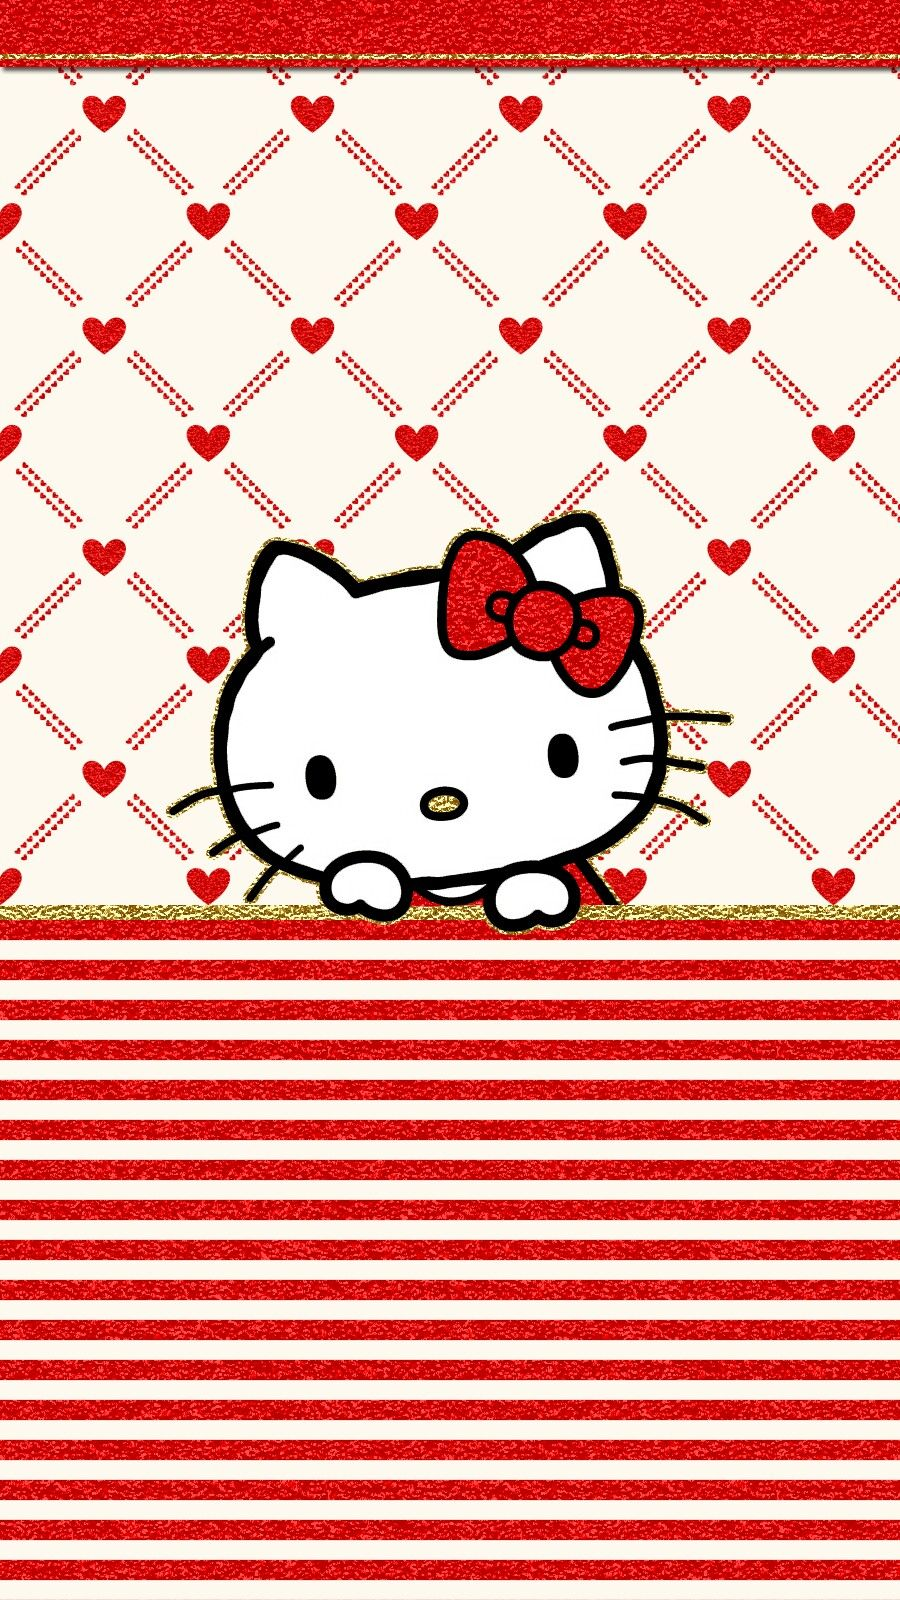 Iphone Wall Valentine S Day Tjn Hello Kitty Sublimados Dibujos